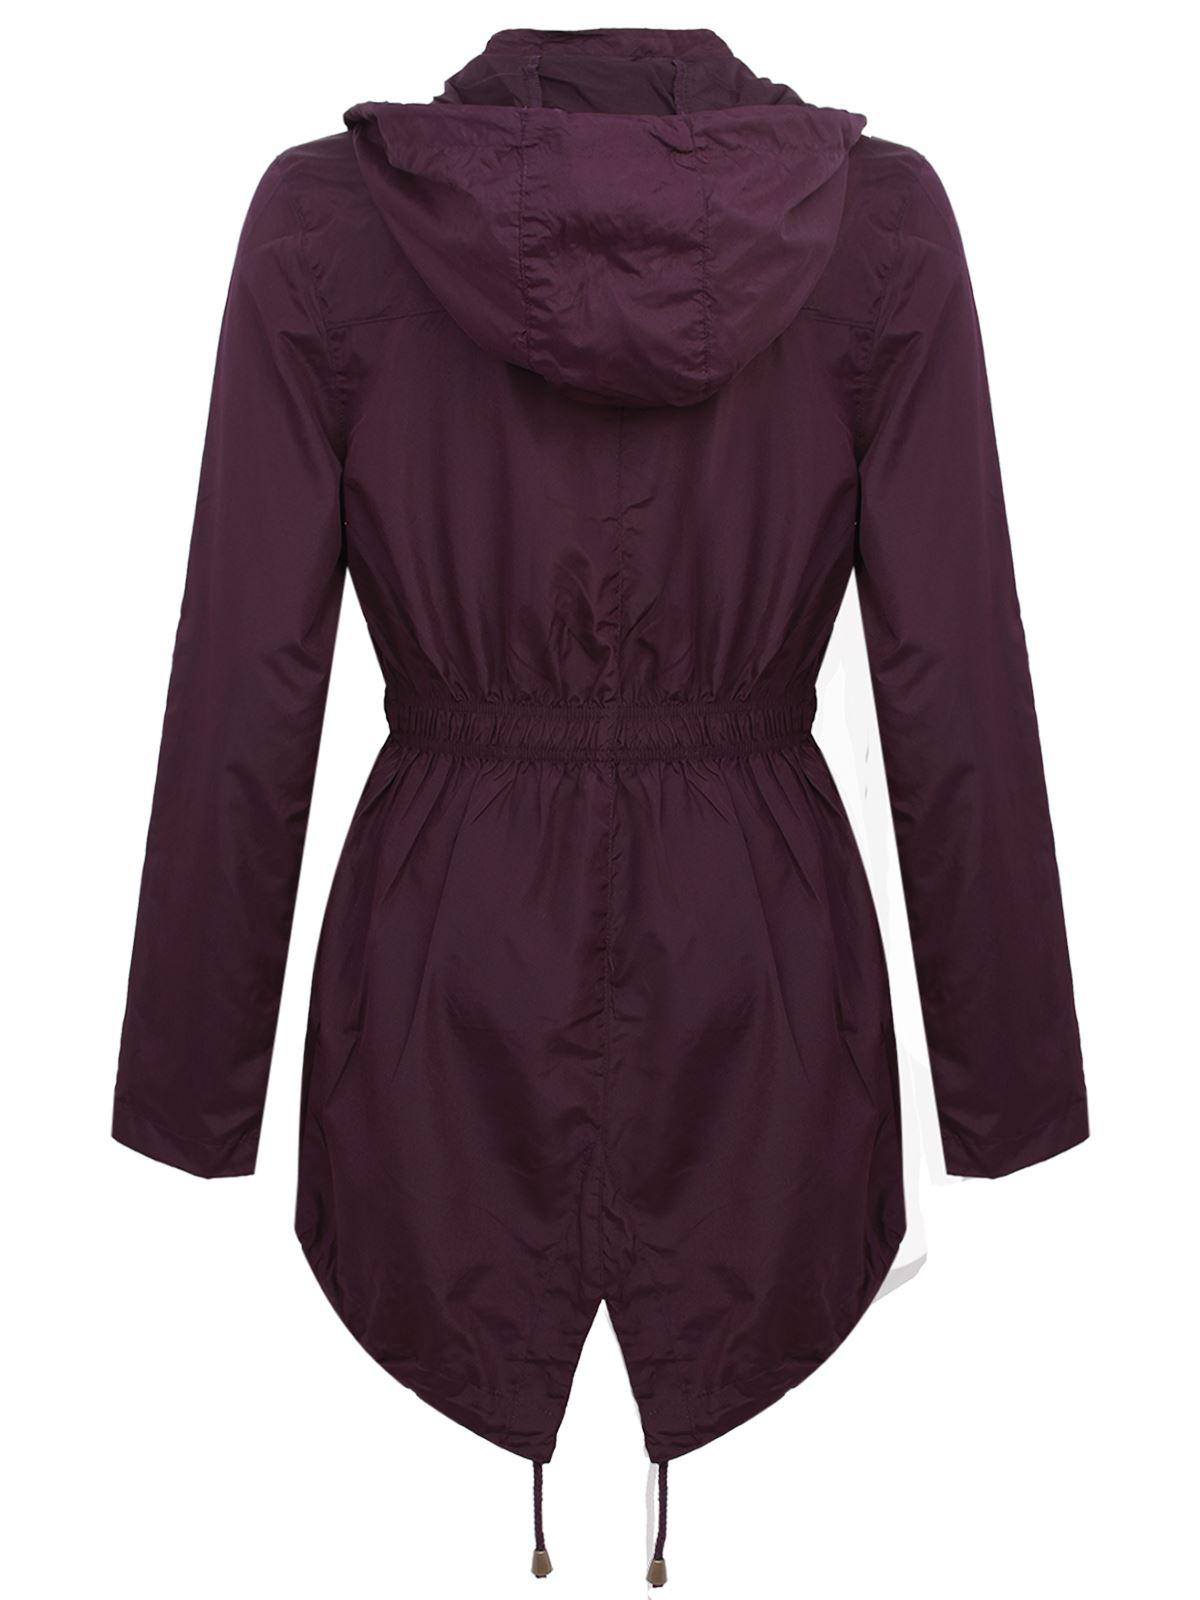 hooded raincoats for women - photo #10